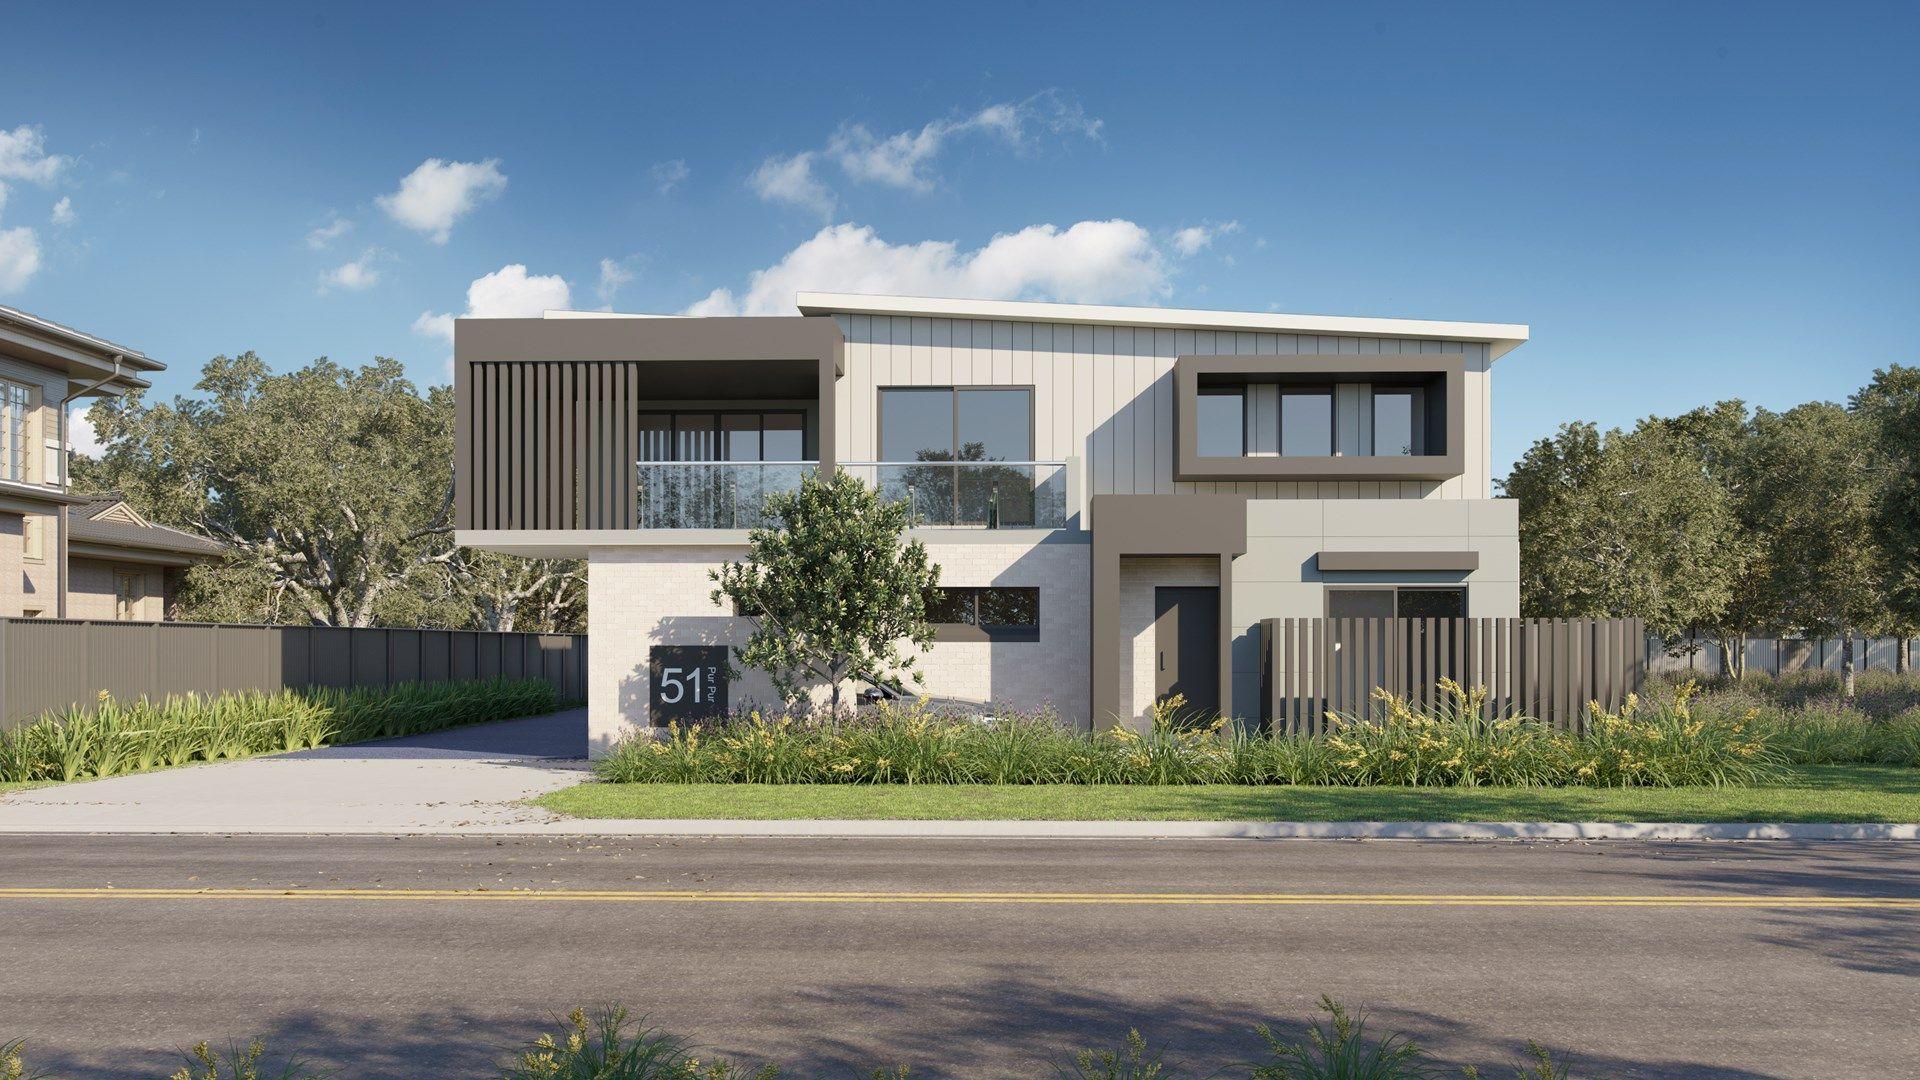 2/51 Pur Pur Avenue, Lake Illawarra NSW 2528, Image 2